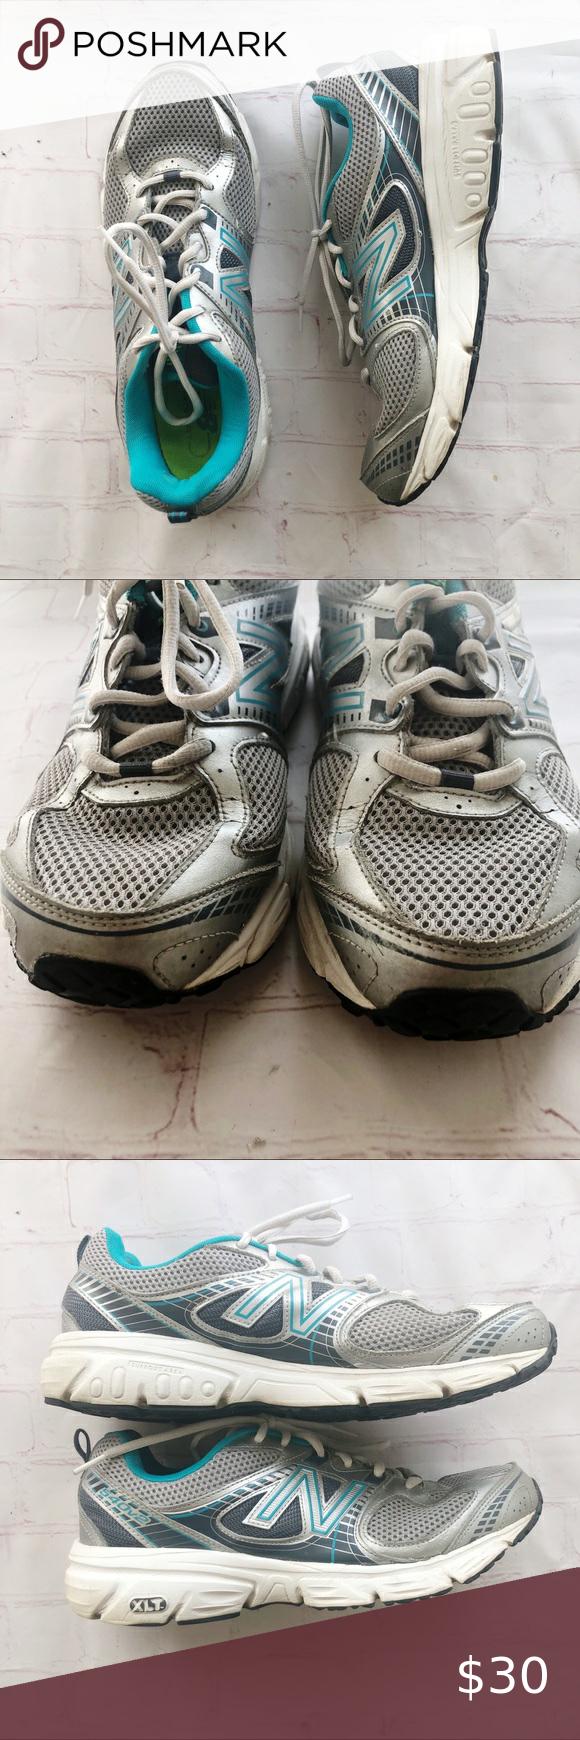 Balance] 540 women's running shoe size